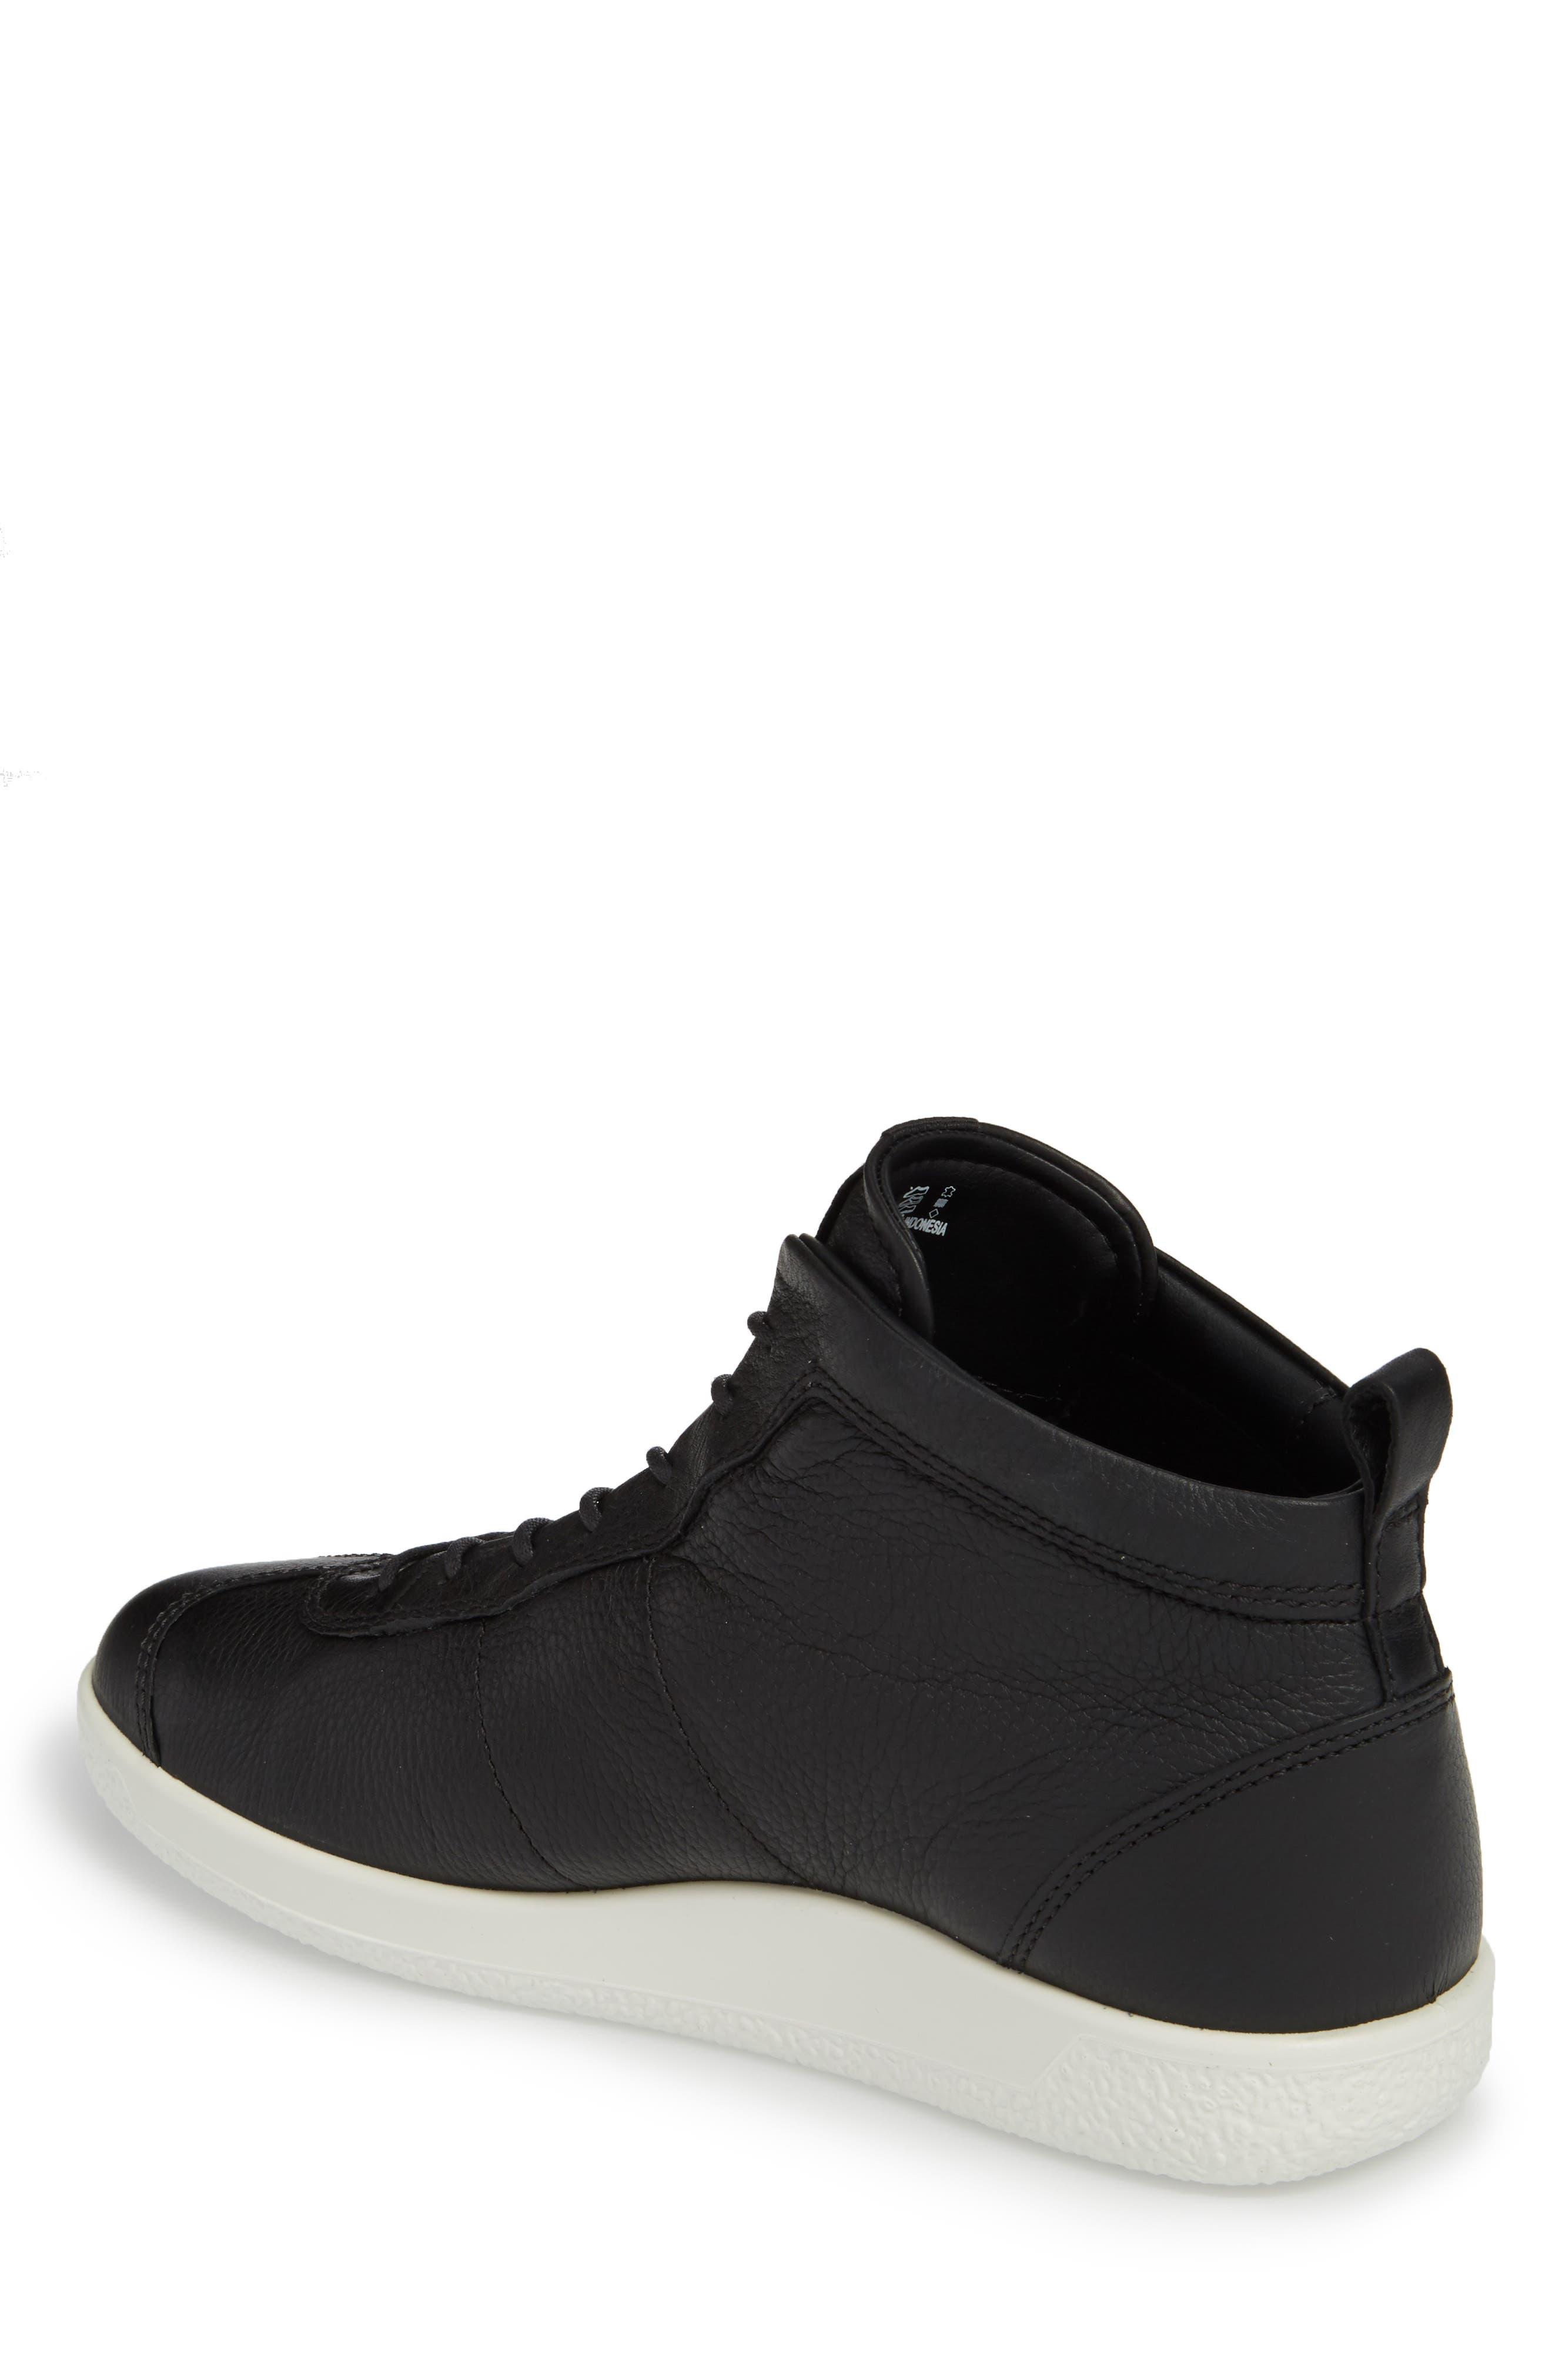 Soft 1 High Top Sneaker,                             Alternate thumbnail 2, color,                             009